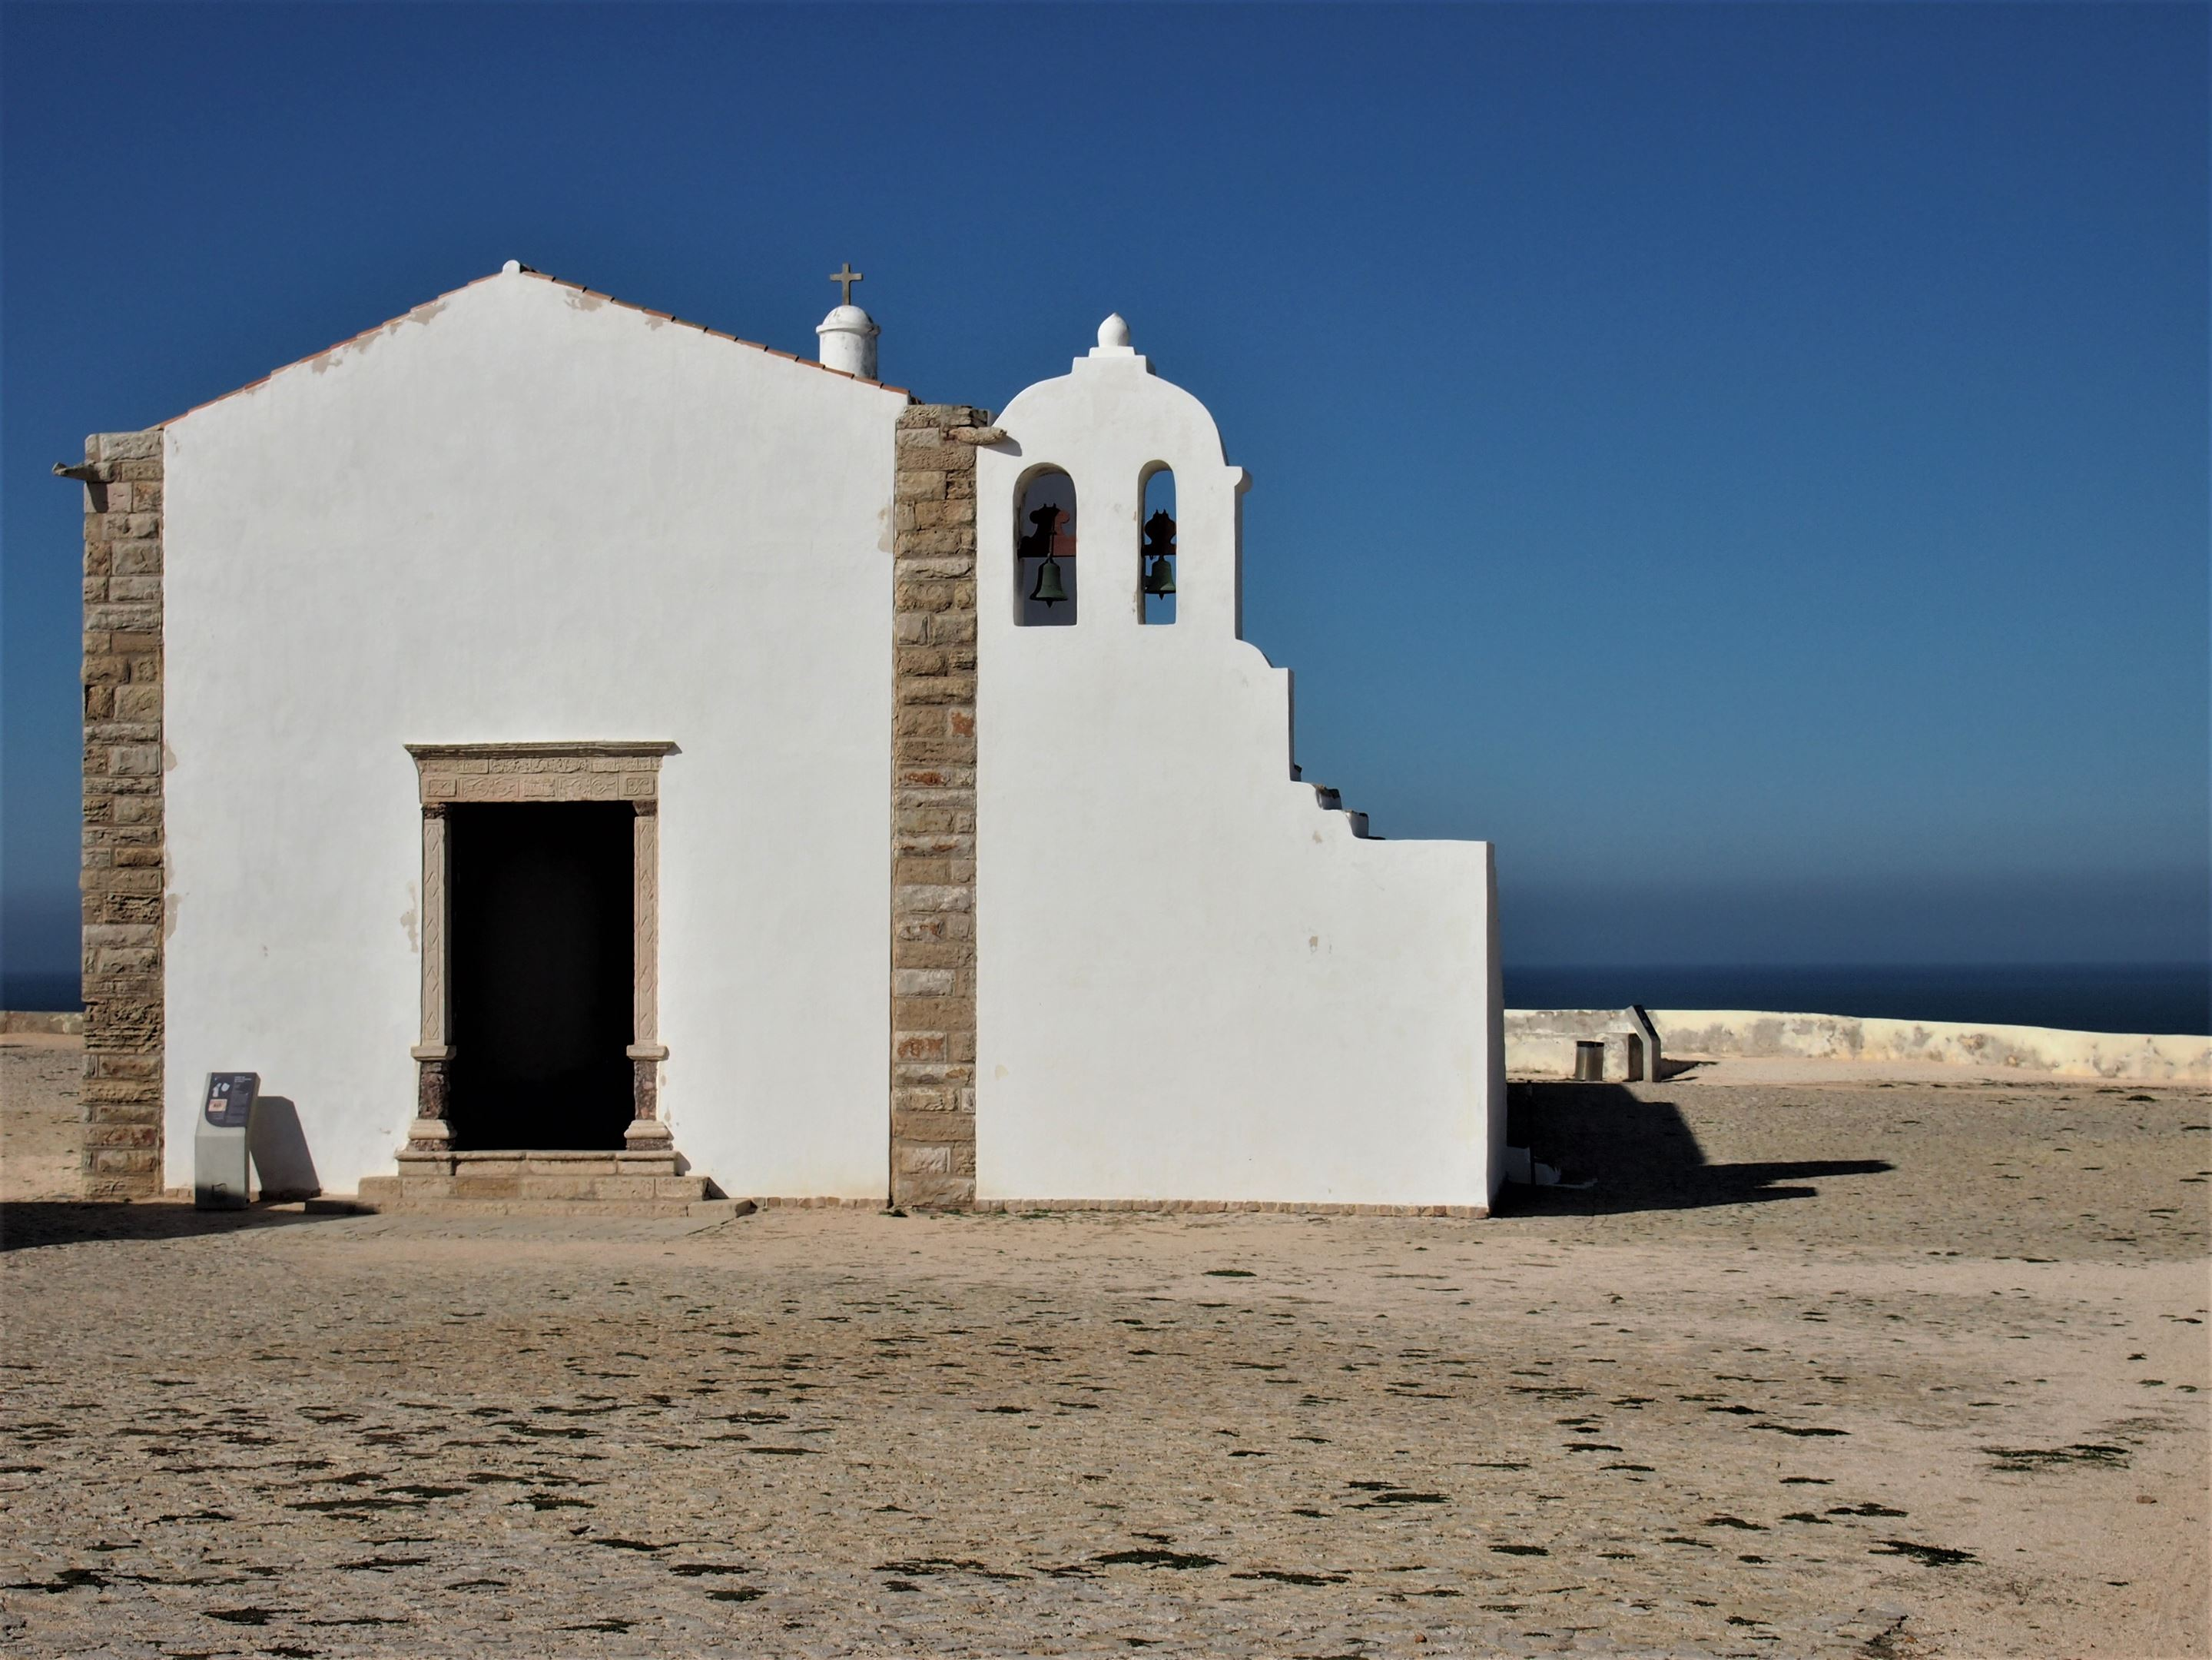 Igreja da Nossa Senhora da Graça, en el interior de la Fortaleza de Sagres, Algarve